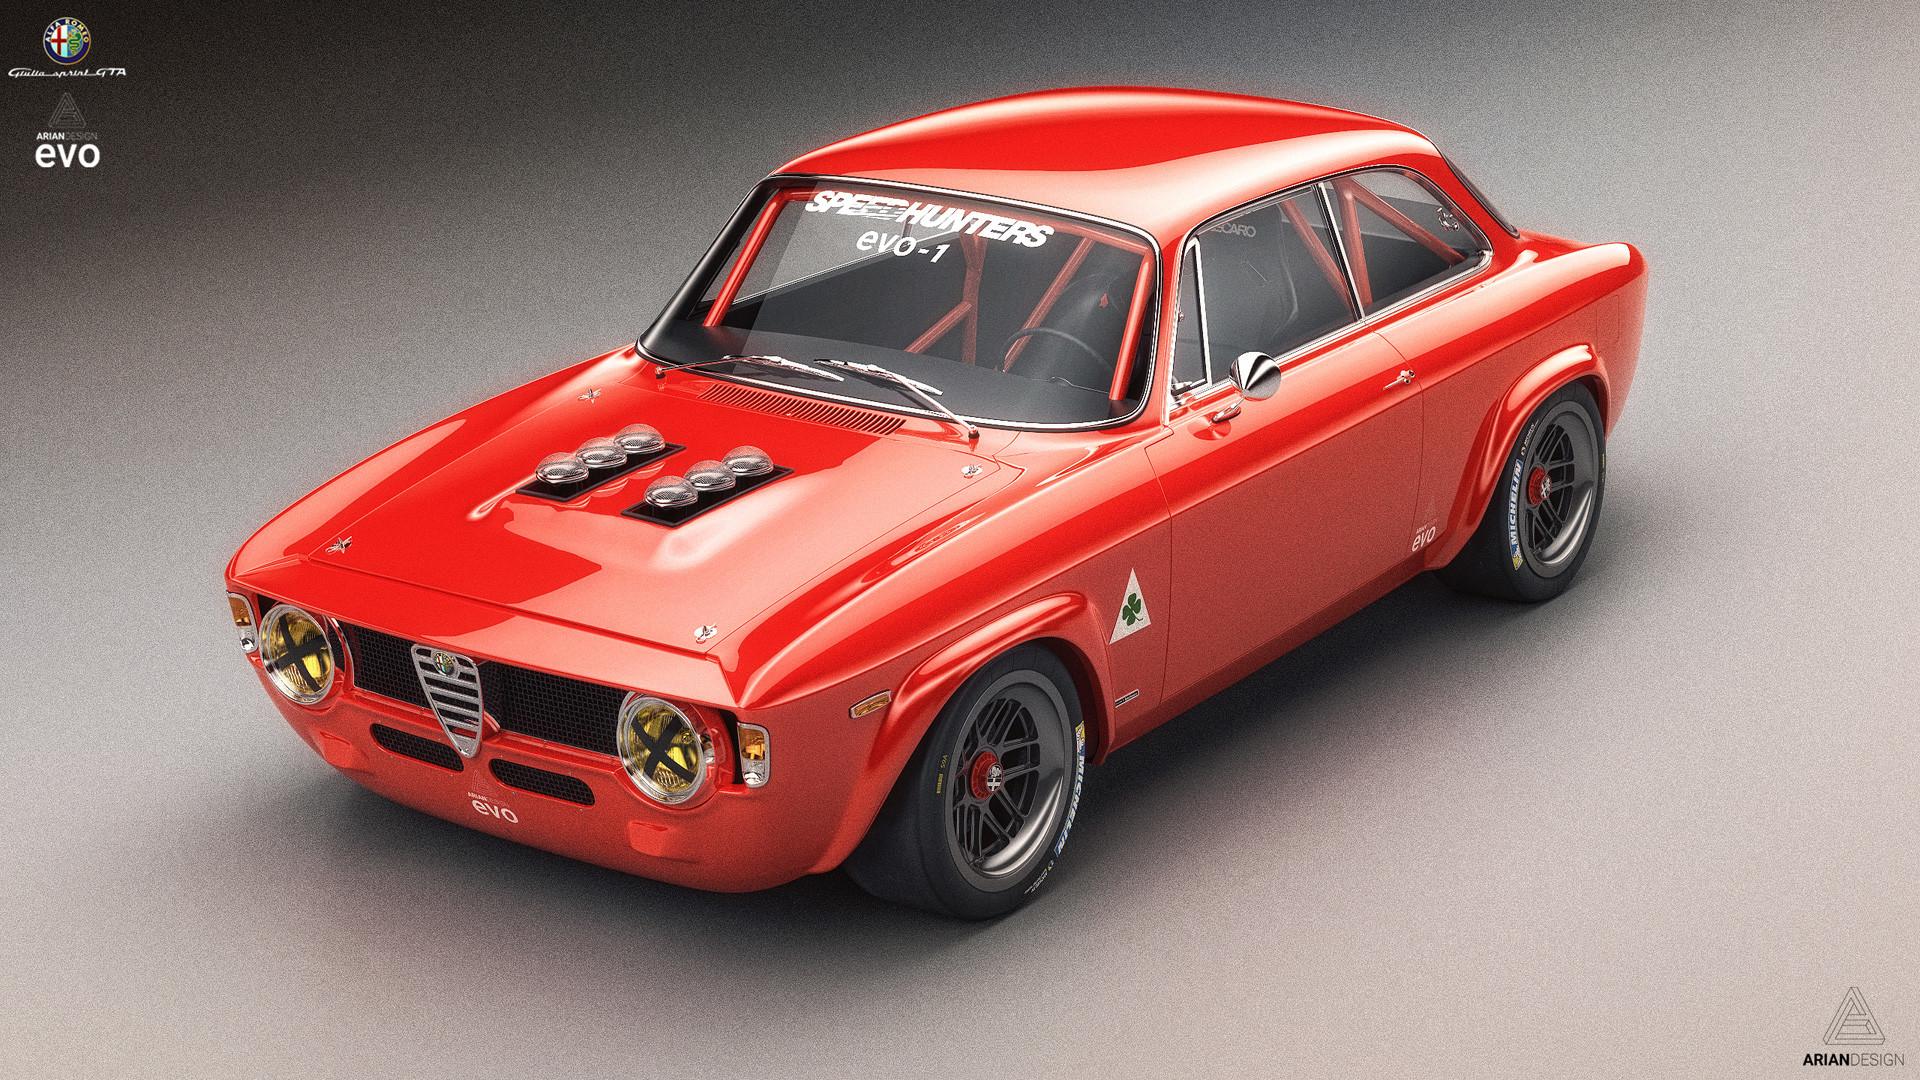 ArtStation - Alfa Romeo Giulia GTA Ariandesign EVO-1 Studio shoots ...